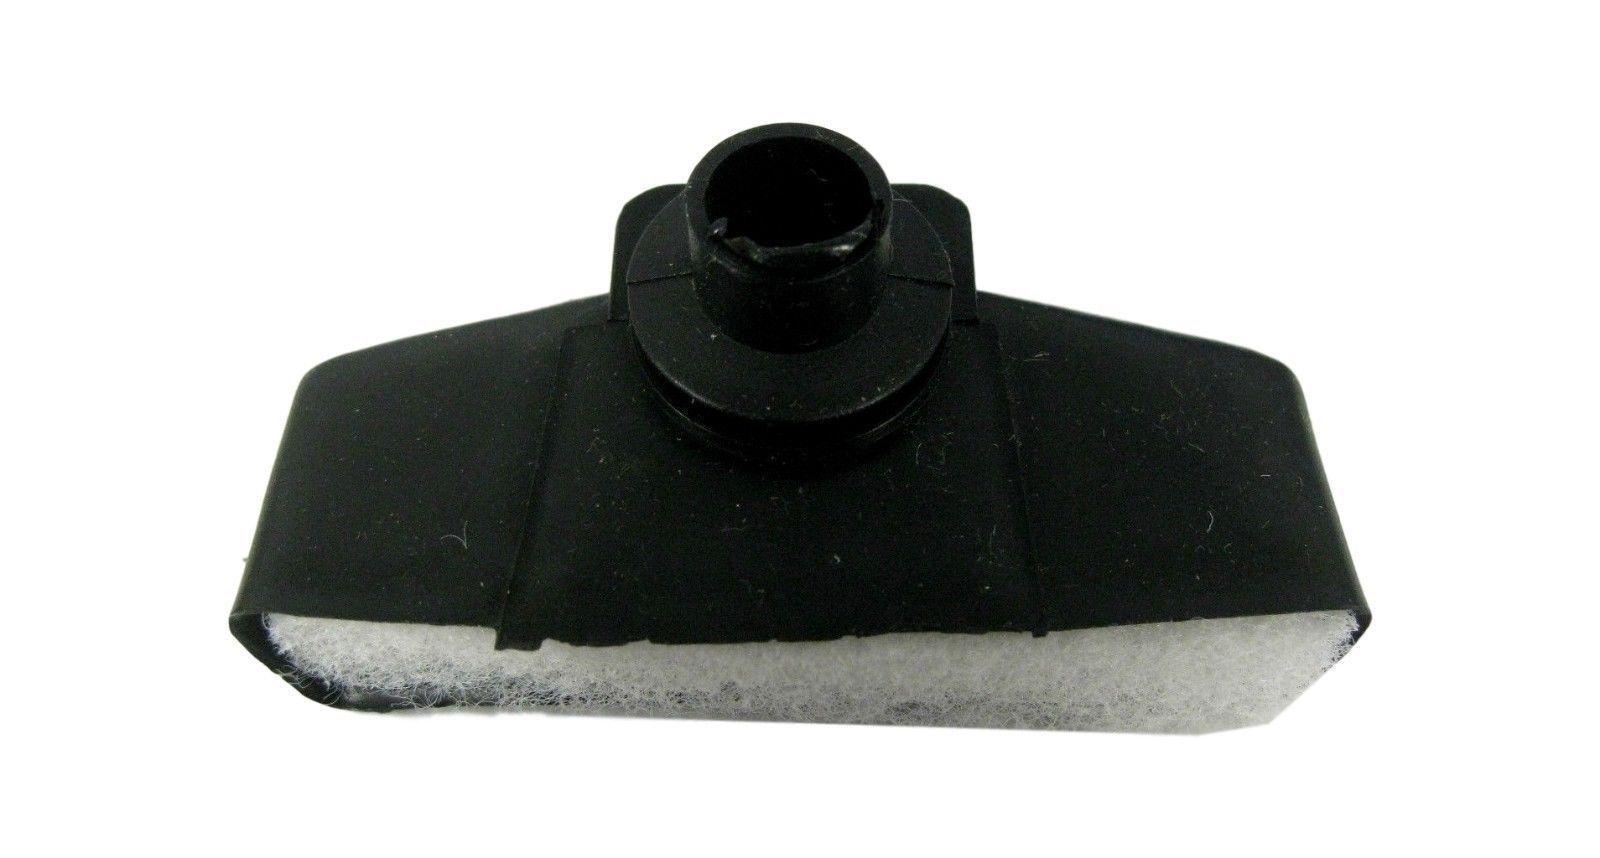 MN-phosphate WIHA Hexagon Ball Head Key 7.94mm Long 369 5//16